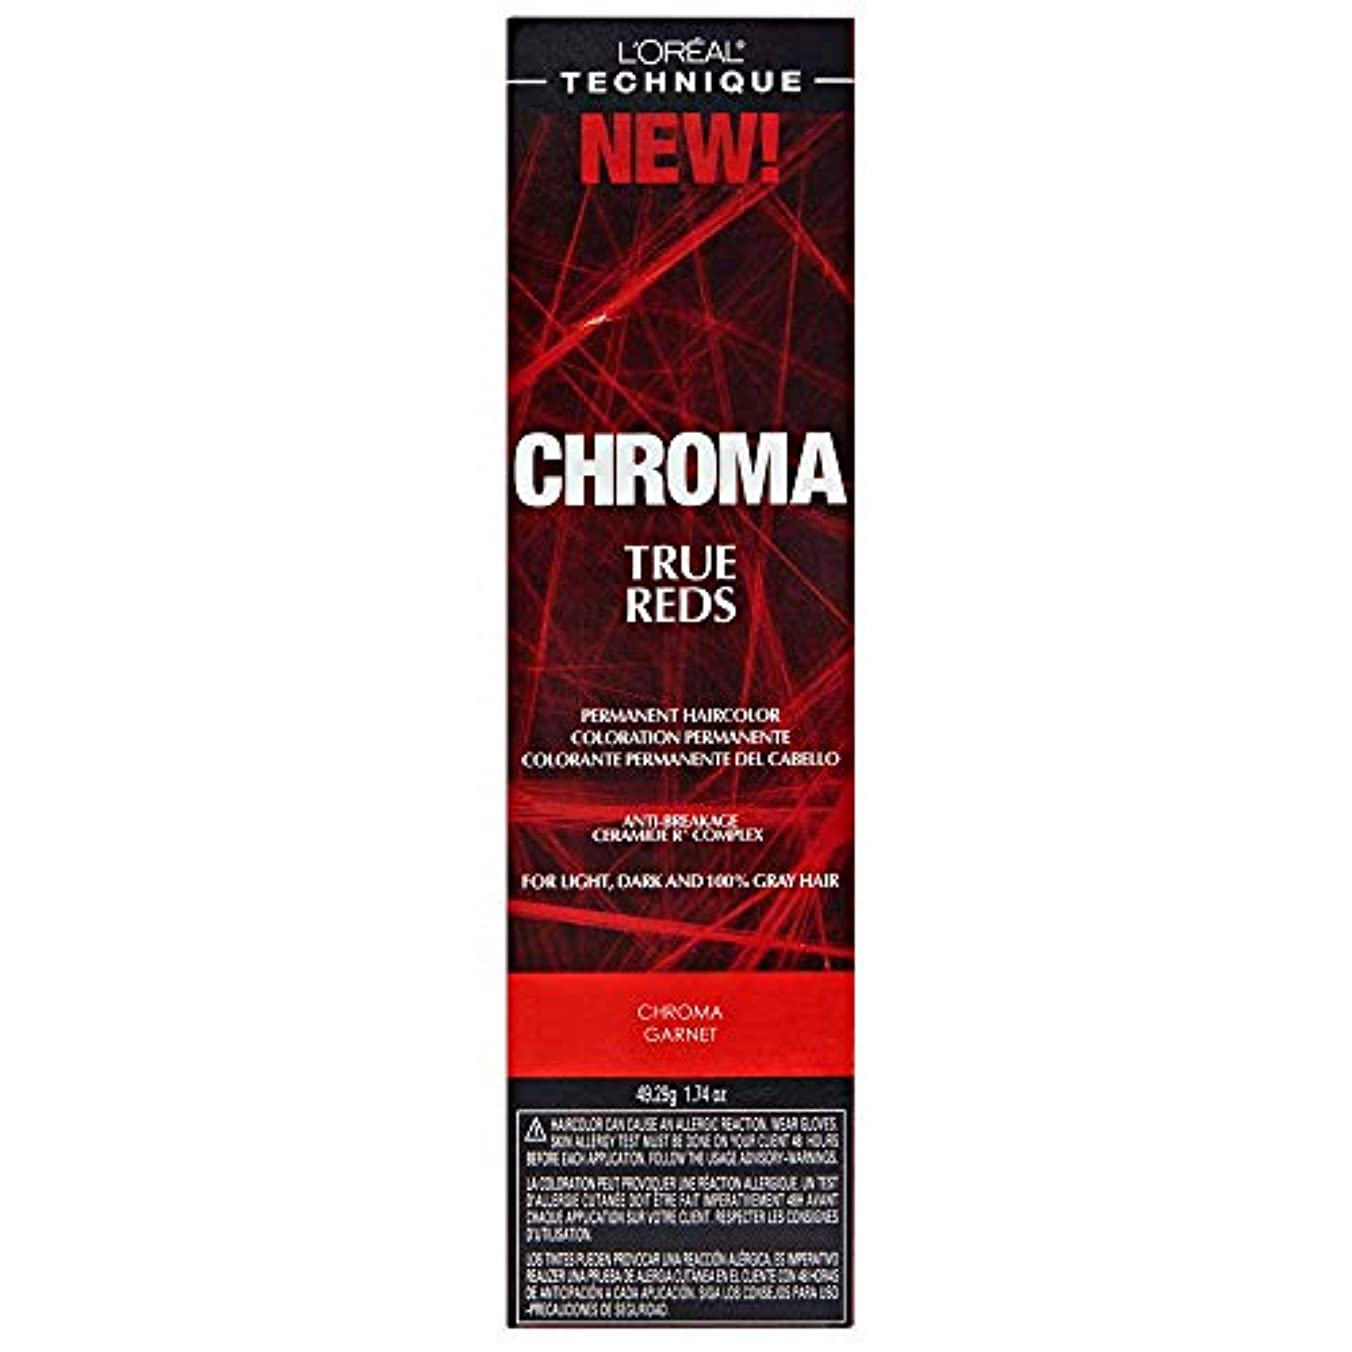 傘類推状況L'Oreal Technique Chroma True Reds - Chroma Garnet - 1.74oz / 49.29g